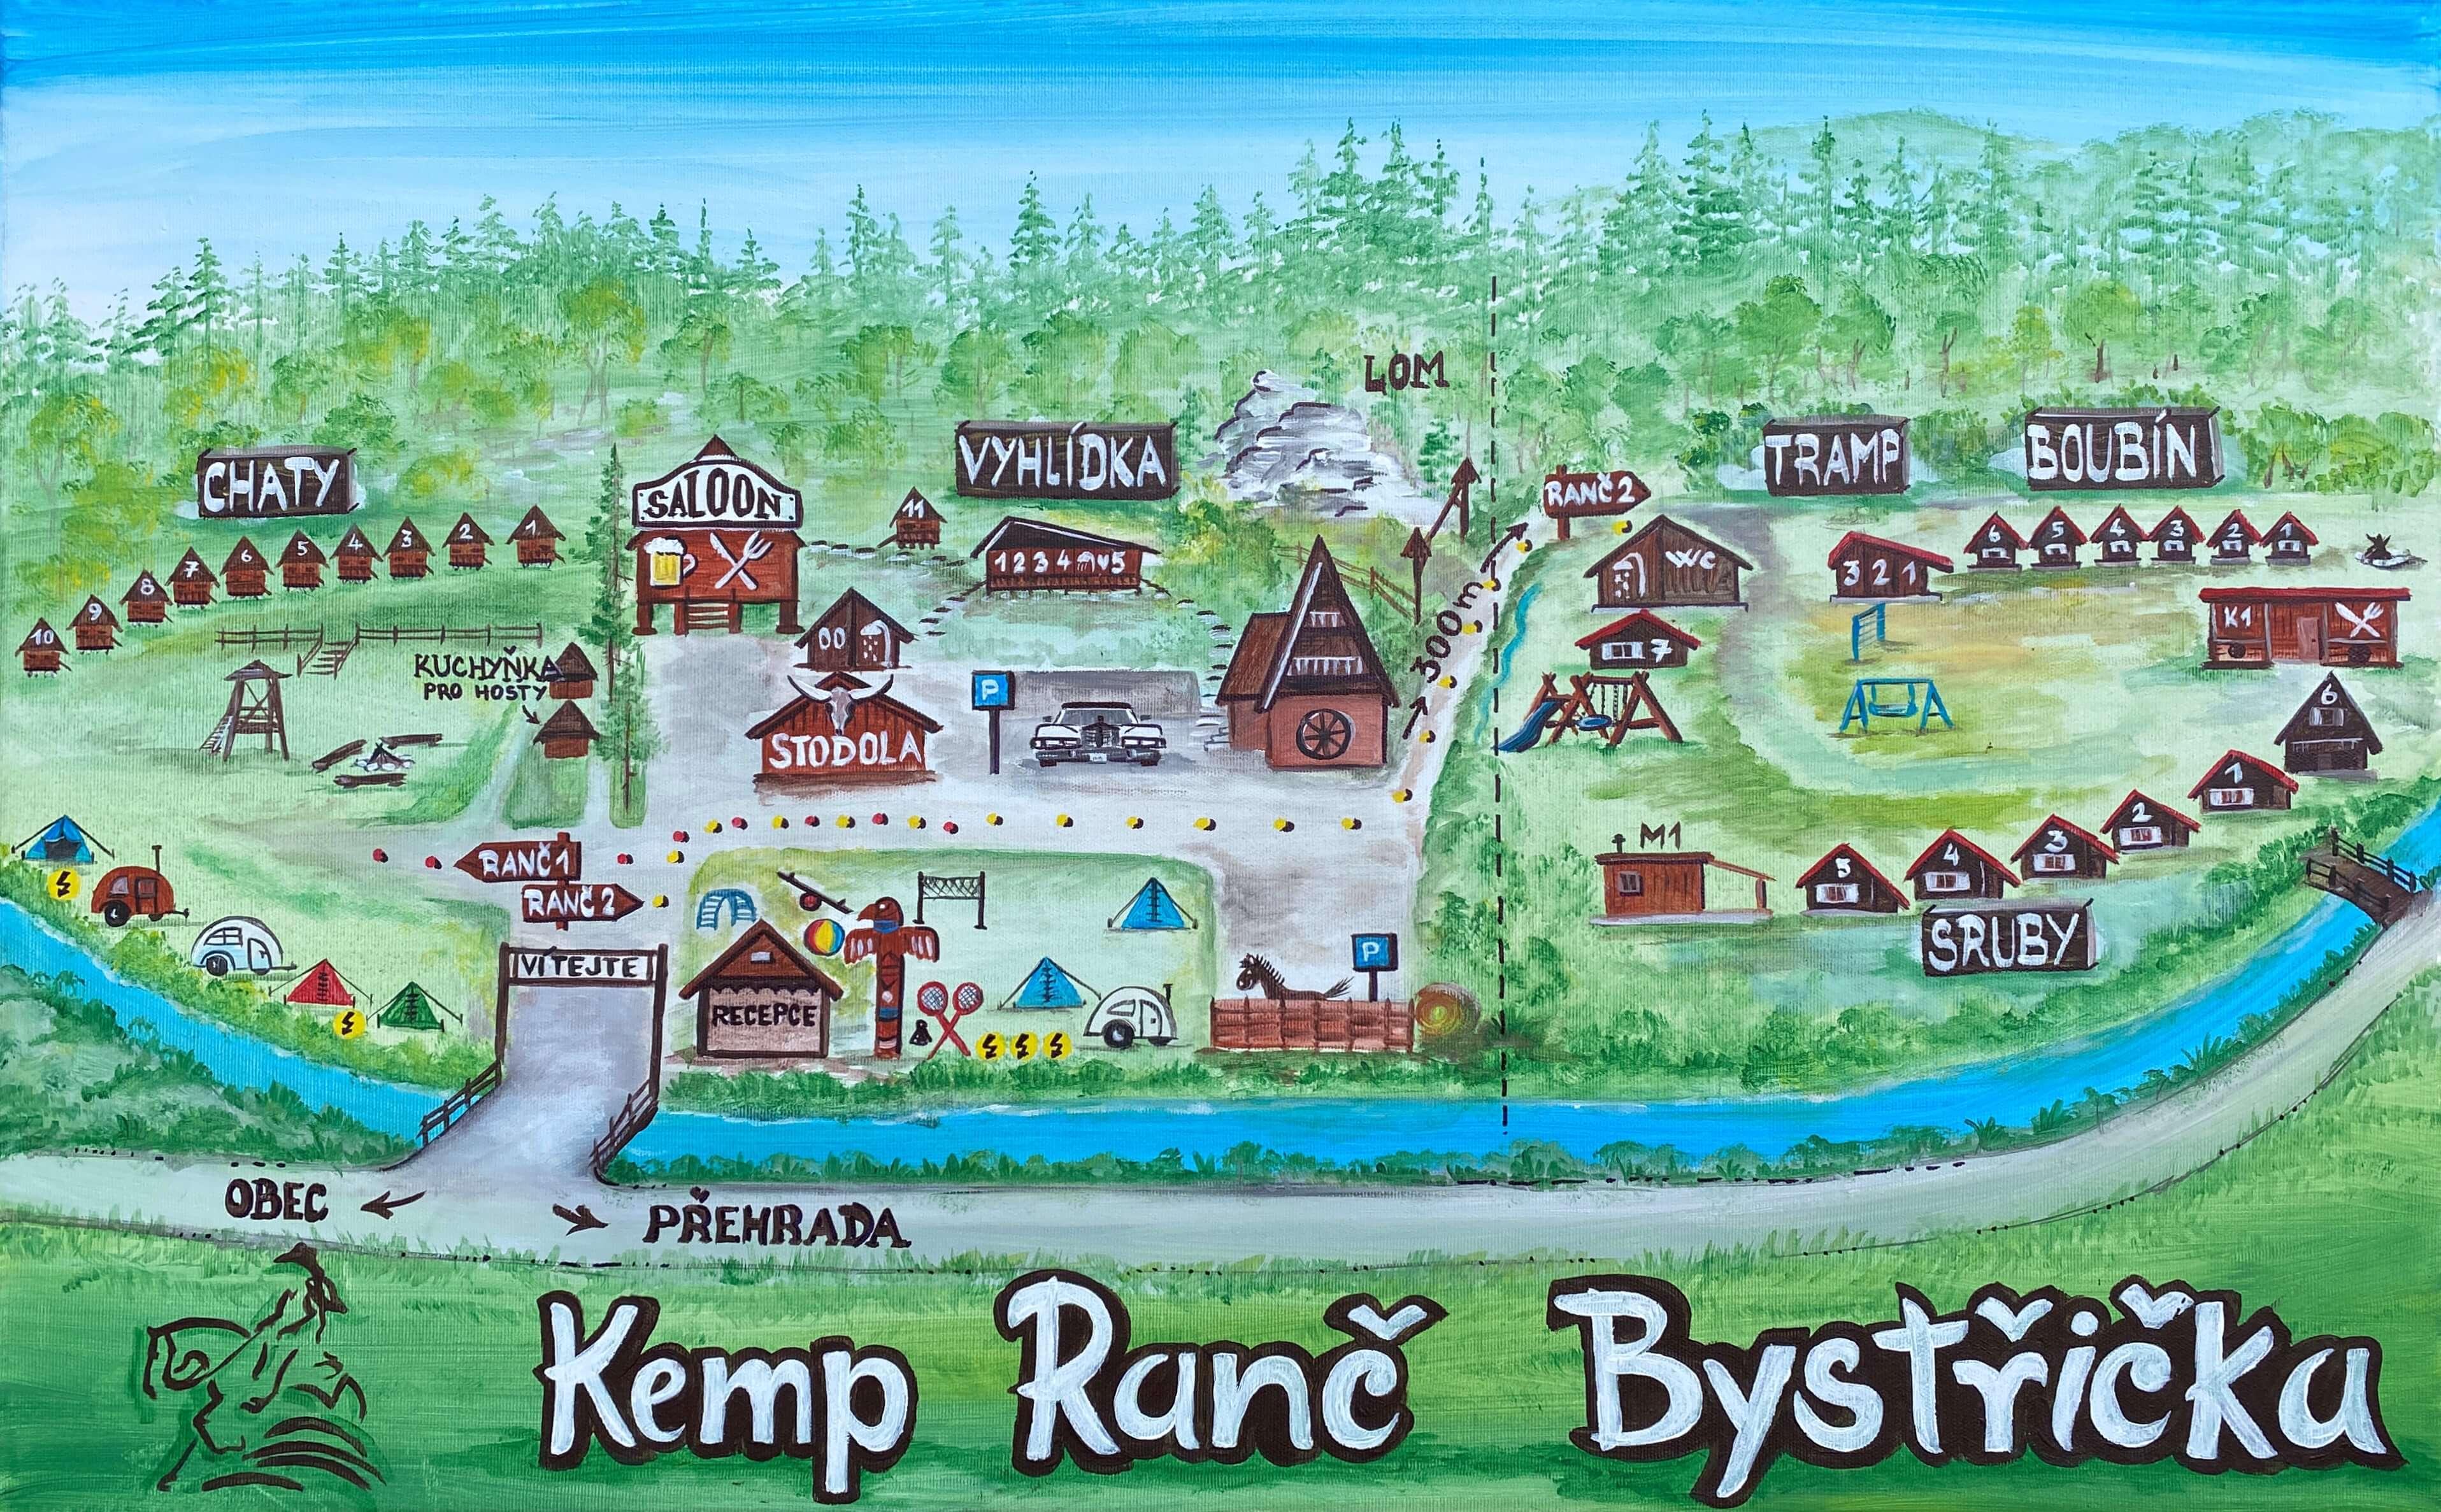 Mapa areálu Kemp Ranč Bystřička